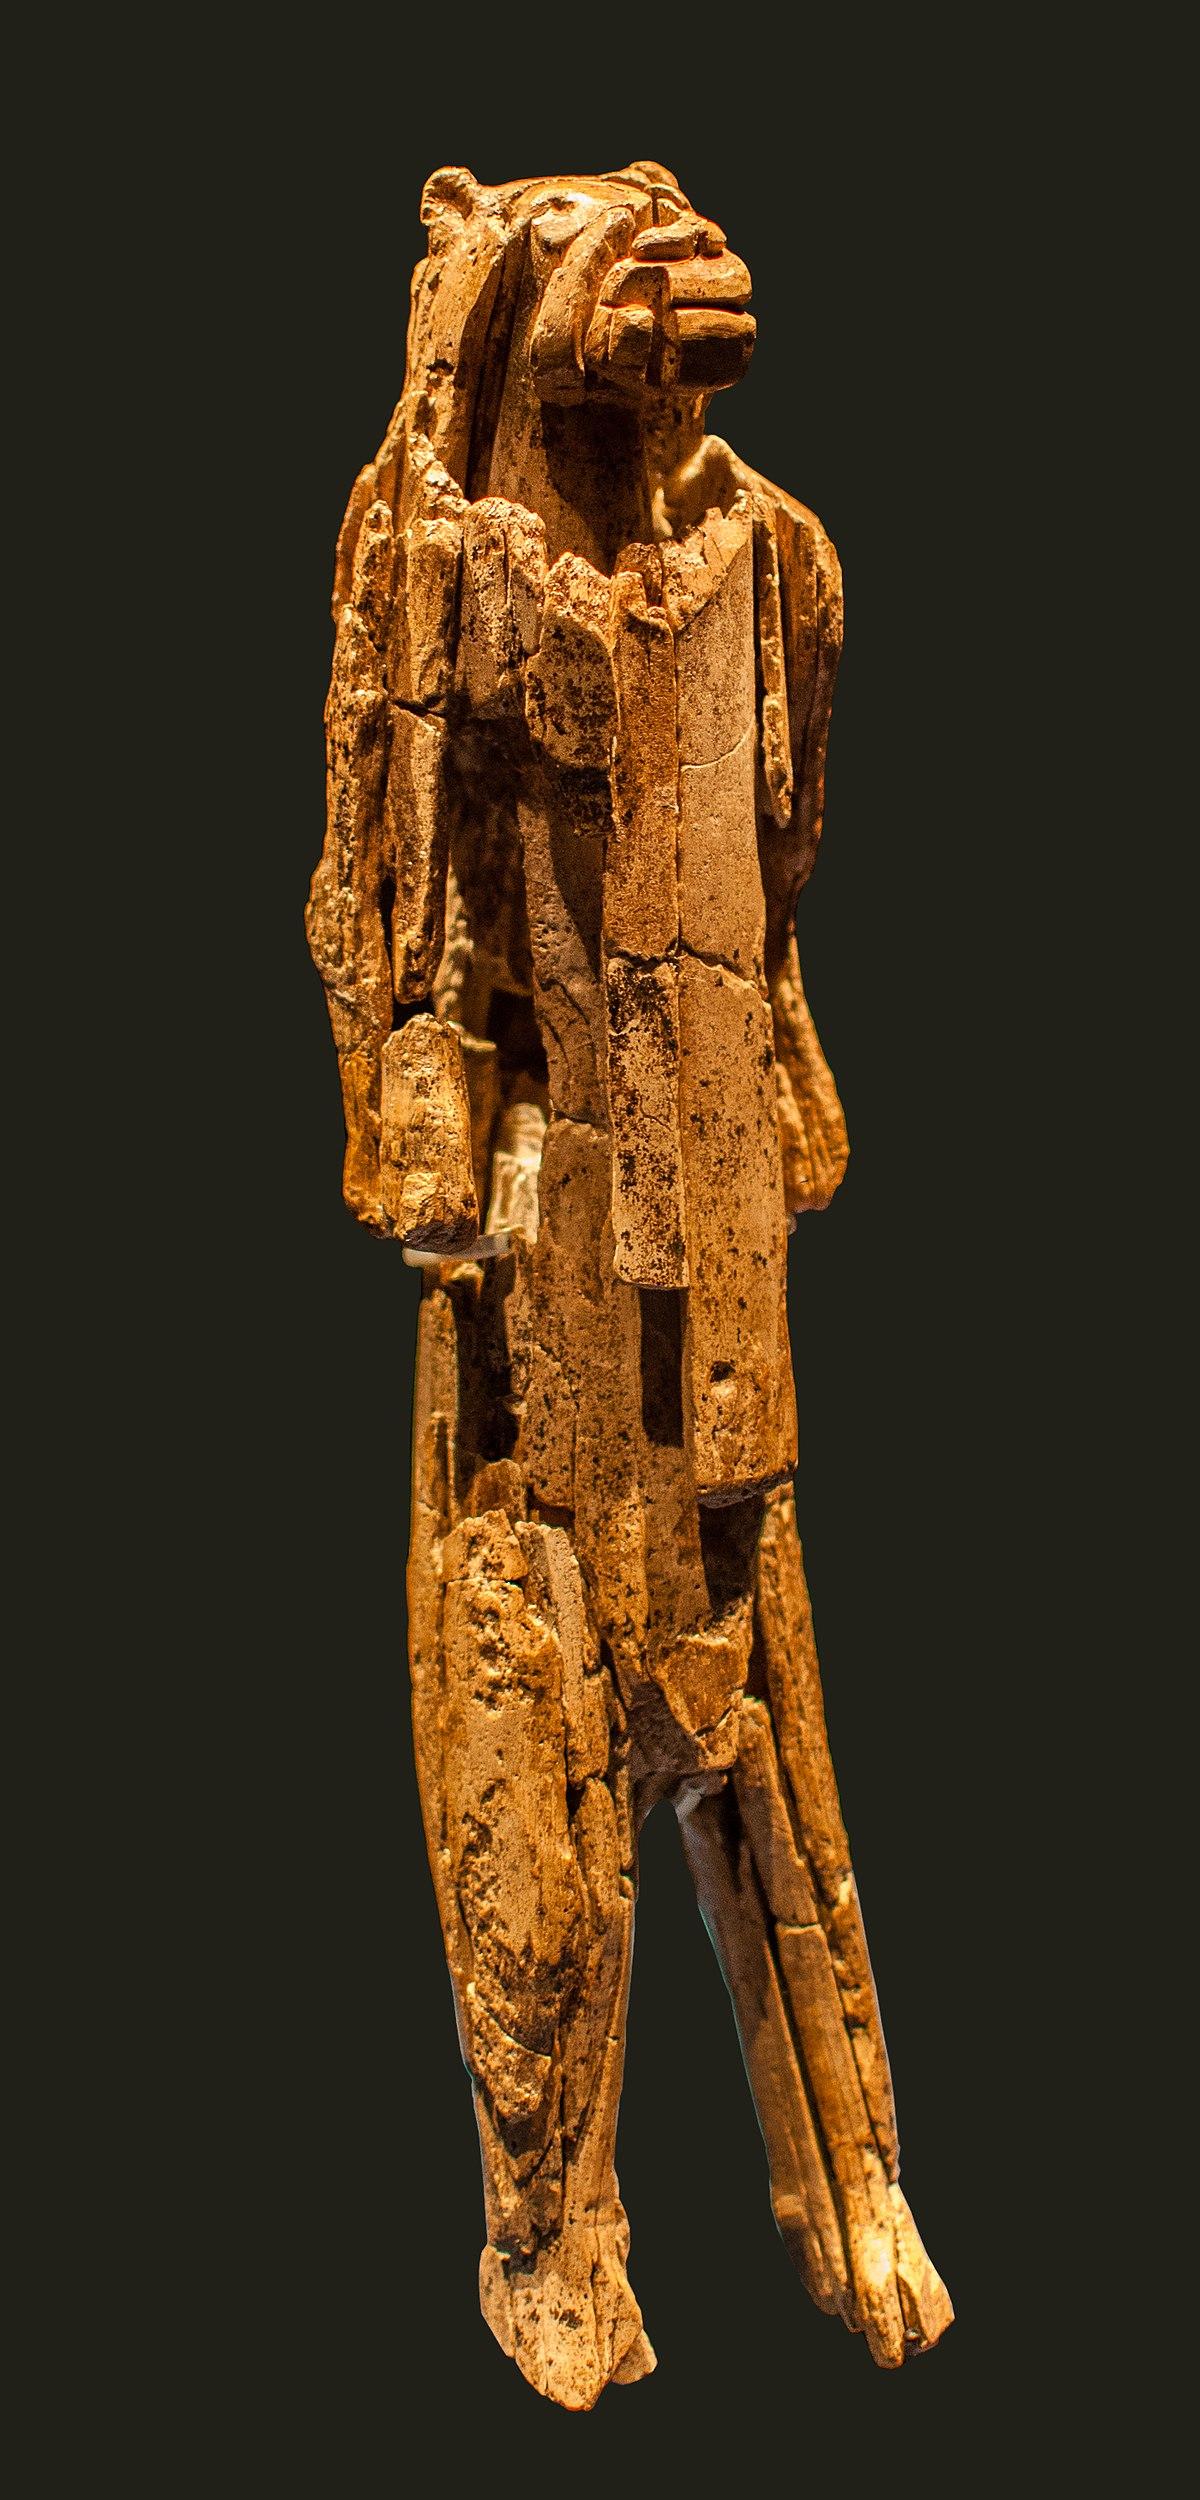 lion man of the hohlenstein stadel wikidata